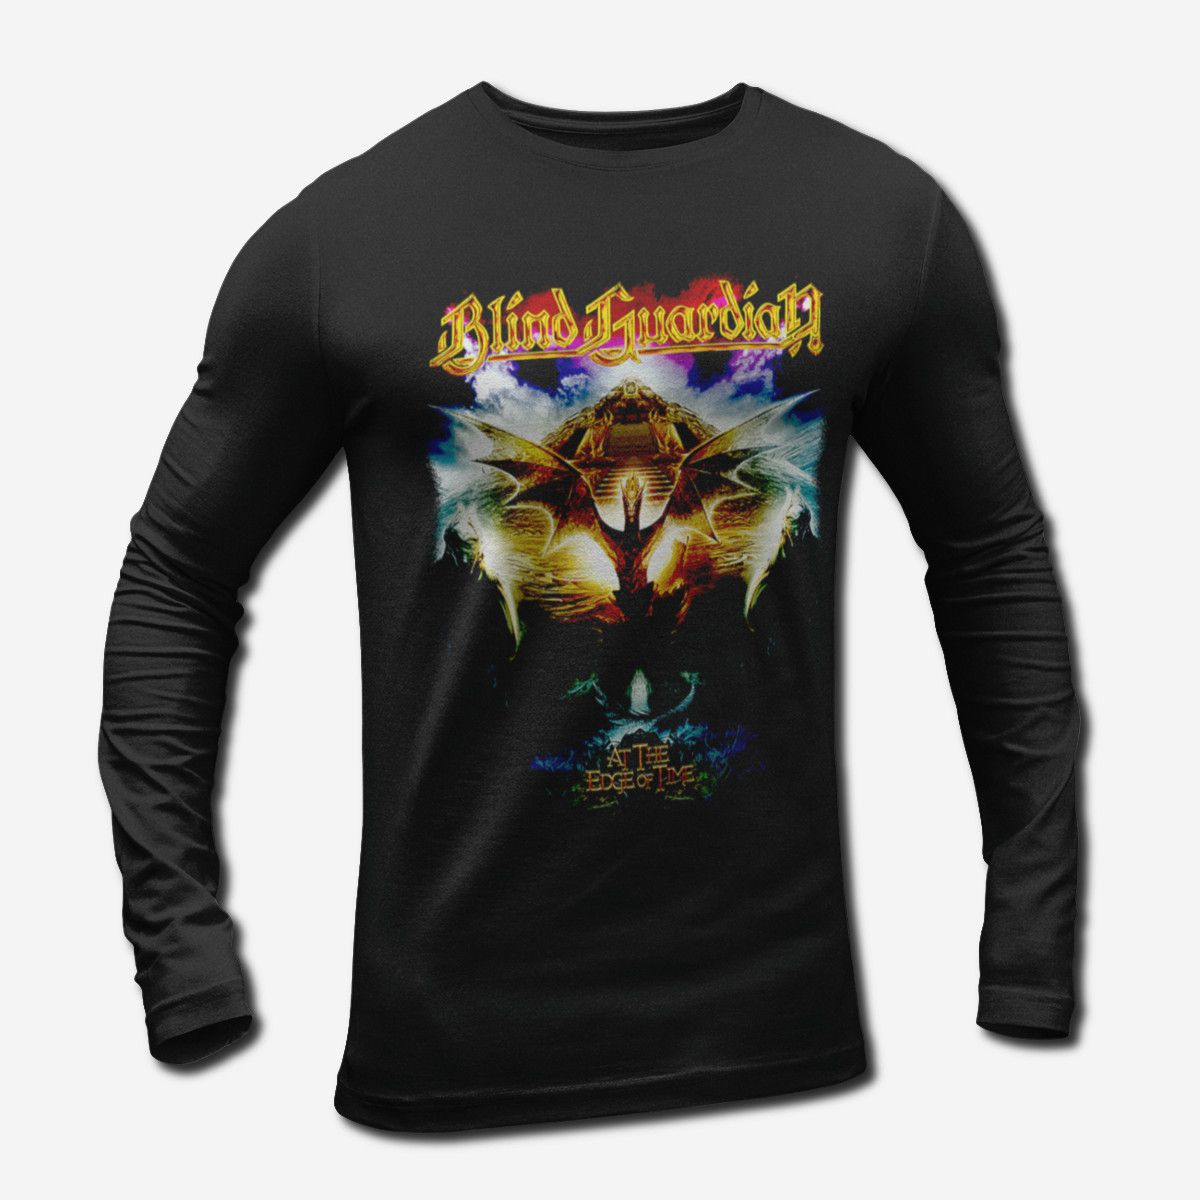 Blind Guardian At The Edge Of Time Long Sleeve T Shirt Power Metal Merch Metal Merch T Shirts Metal Merchandise T Shirts